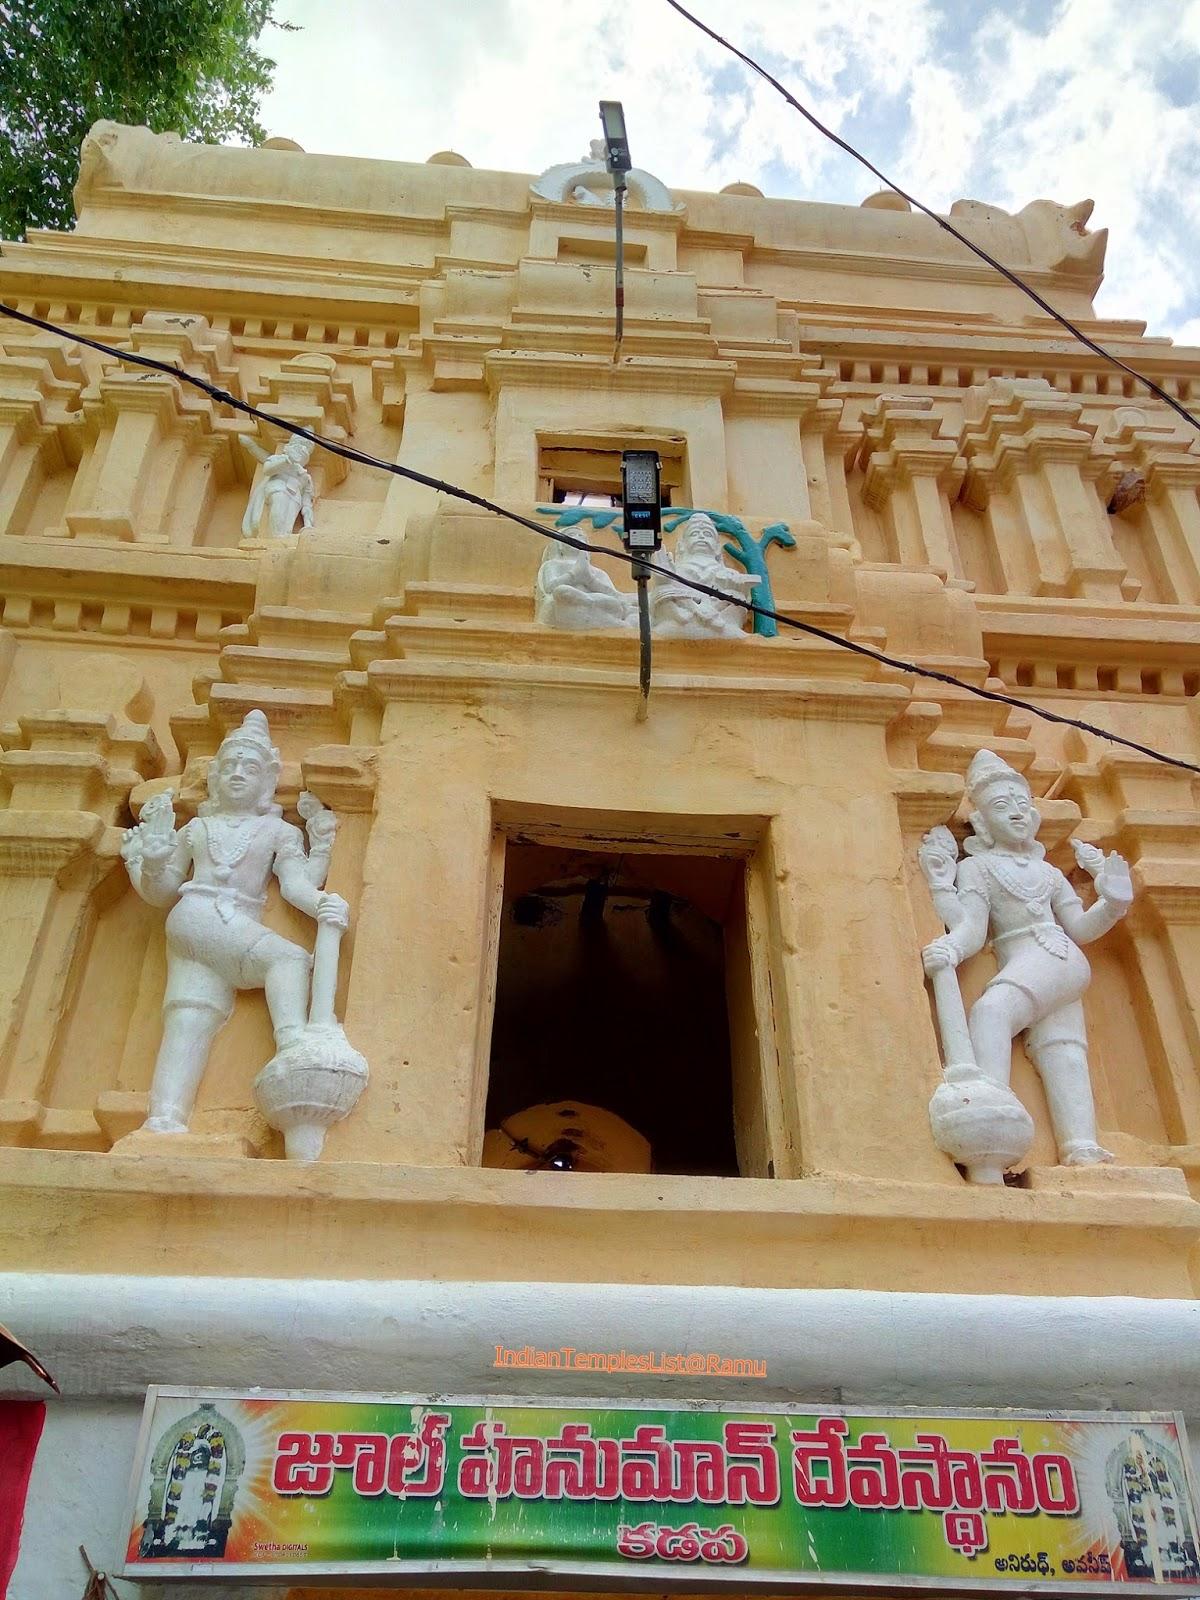 Jool Sri Mukhya Prana Hanuman Temple